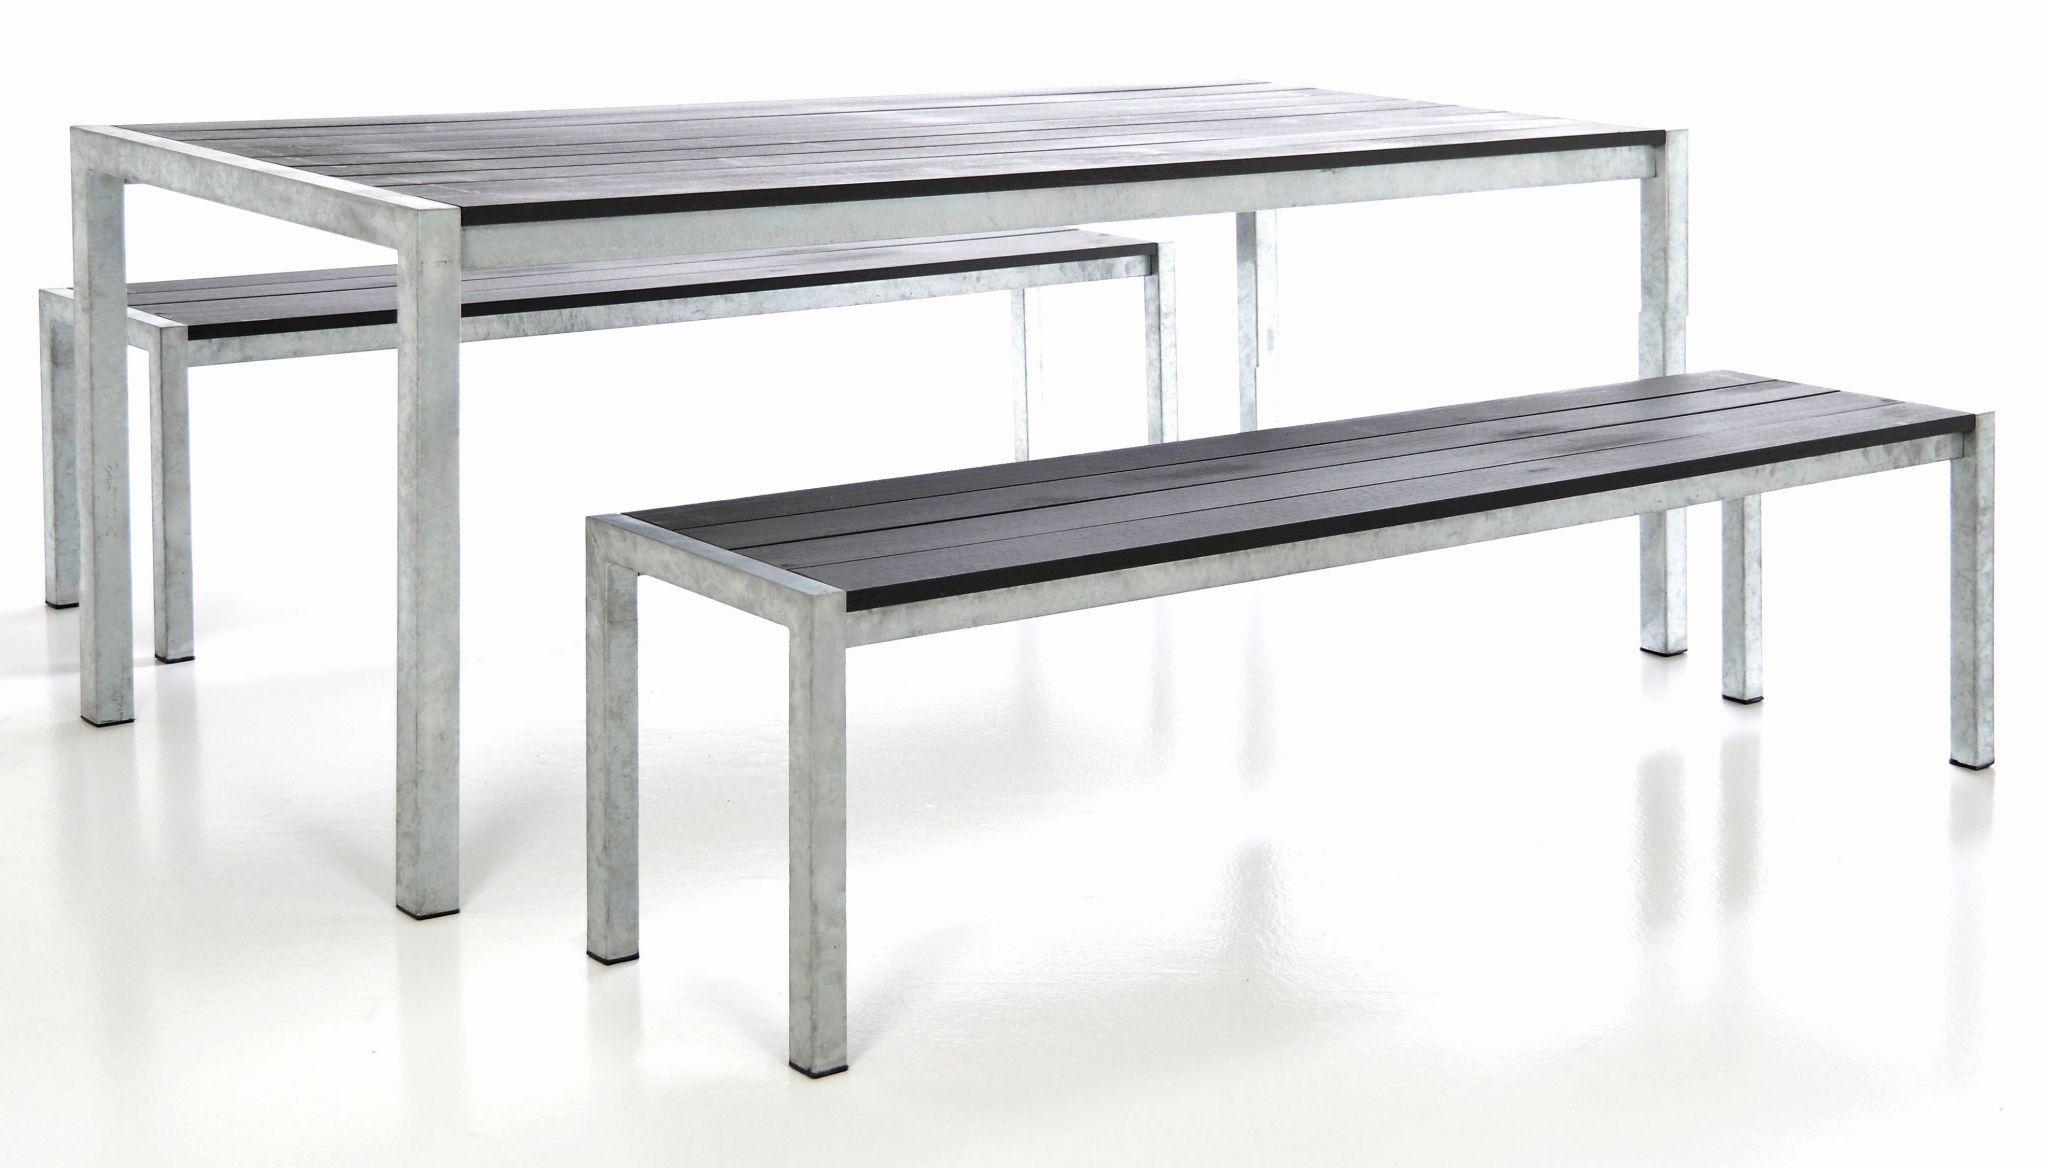 Banc Jardin Aluminium Inspirant Table Et Banc Pour Terrasse